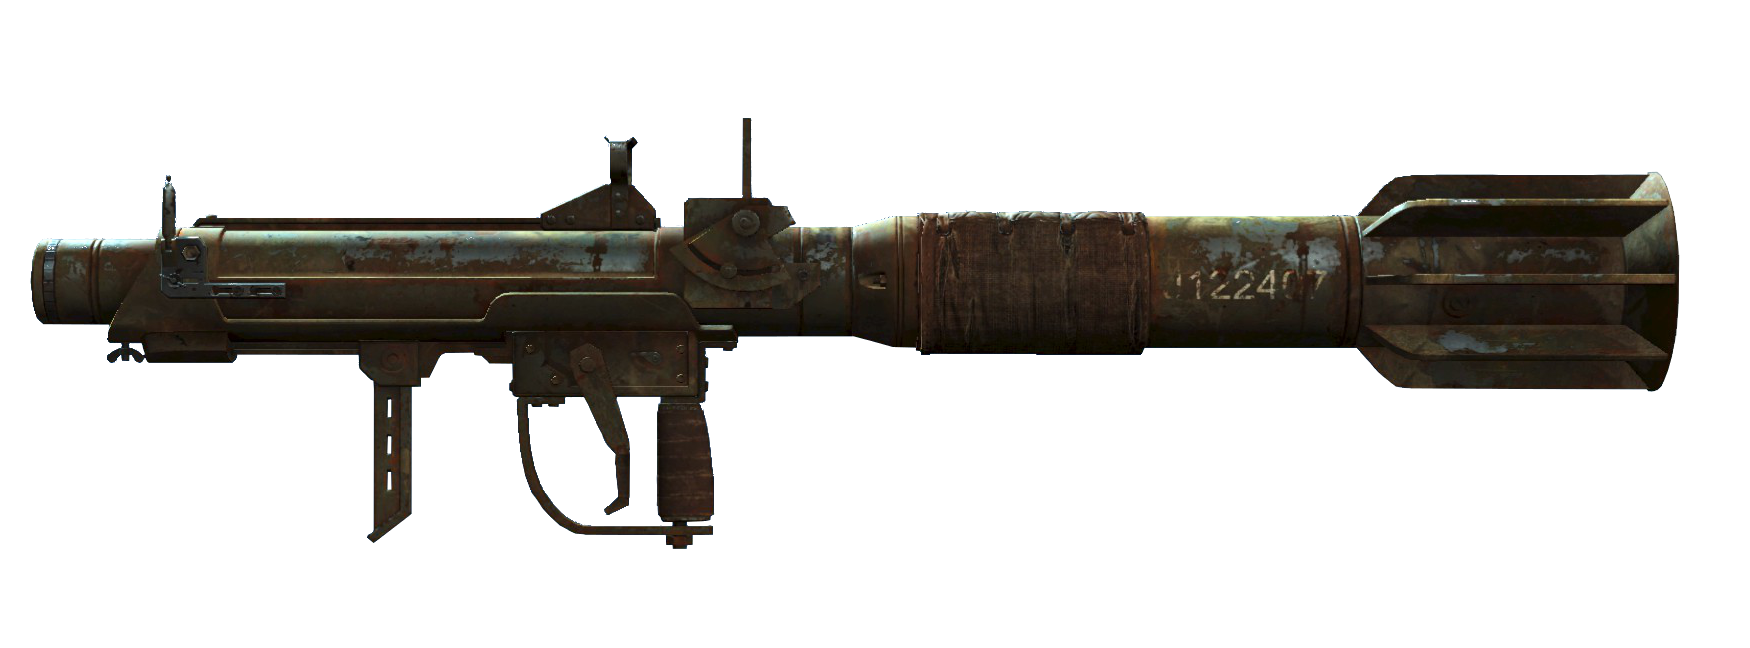 Clipart gun submachine gun. Missile launcher fallout wiki